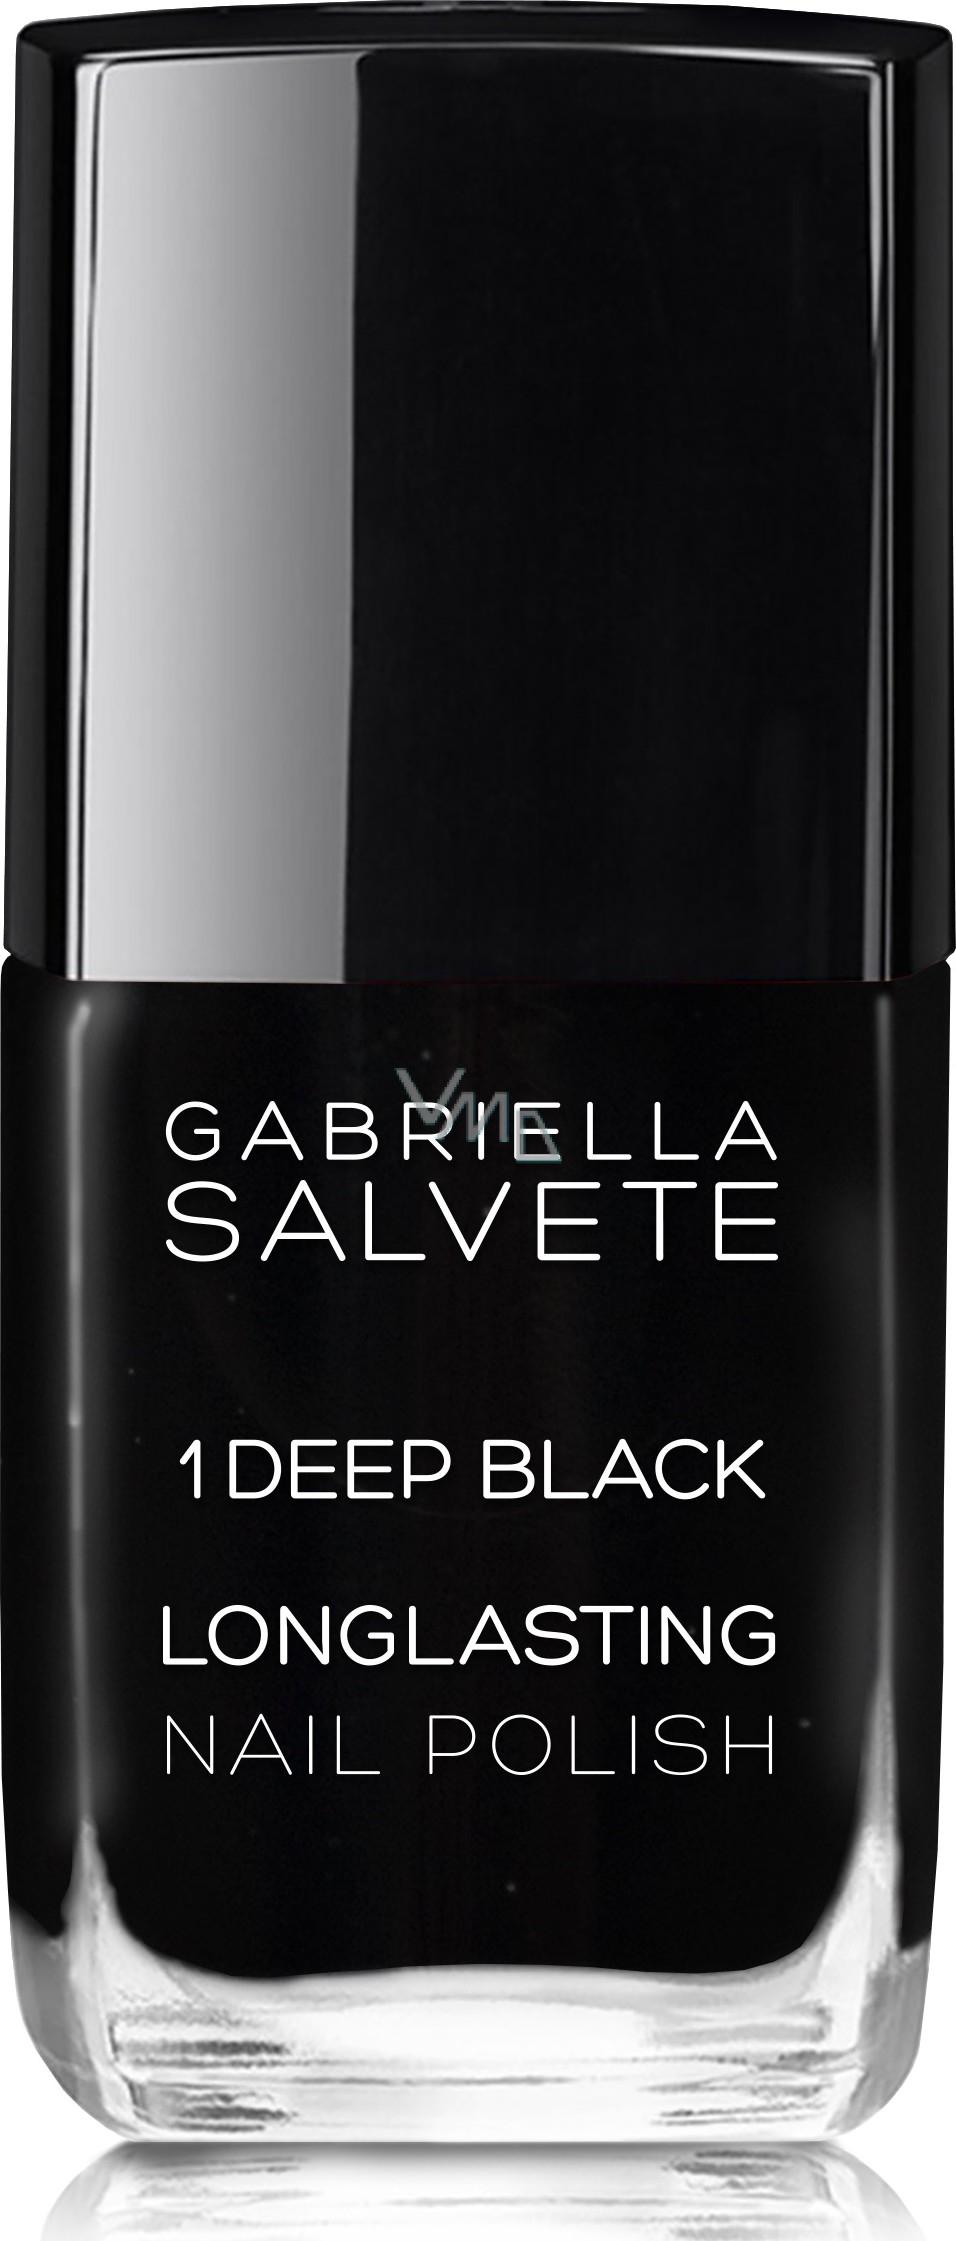 Gabriella Salvete Longlasting Enamel Nail Polish 01 Deep Black 11 Ml Vmd Parfumerie Drogerie